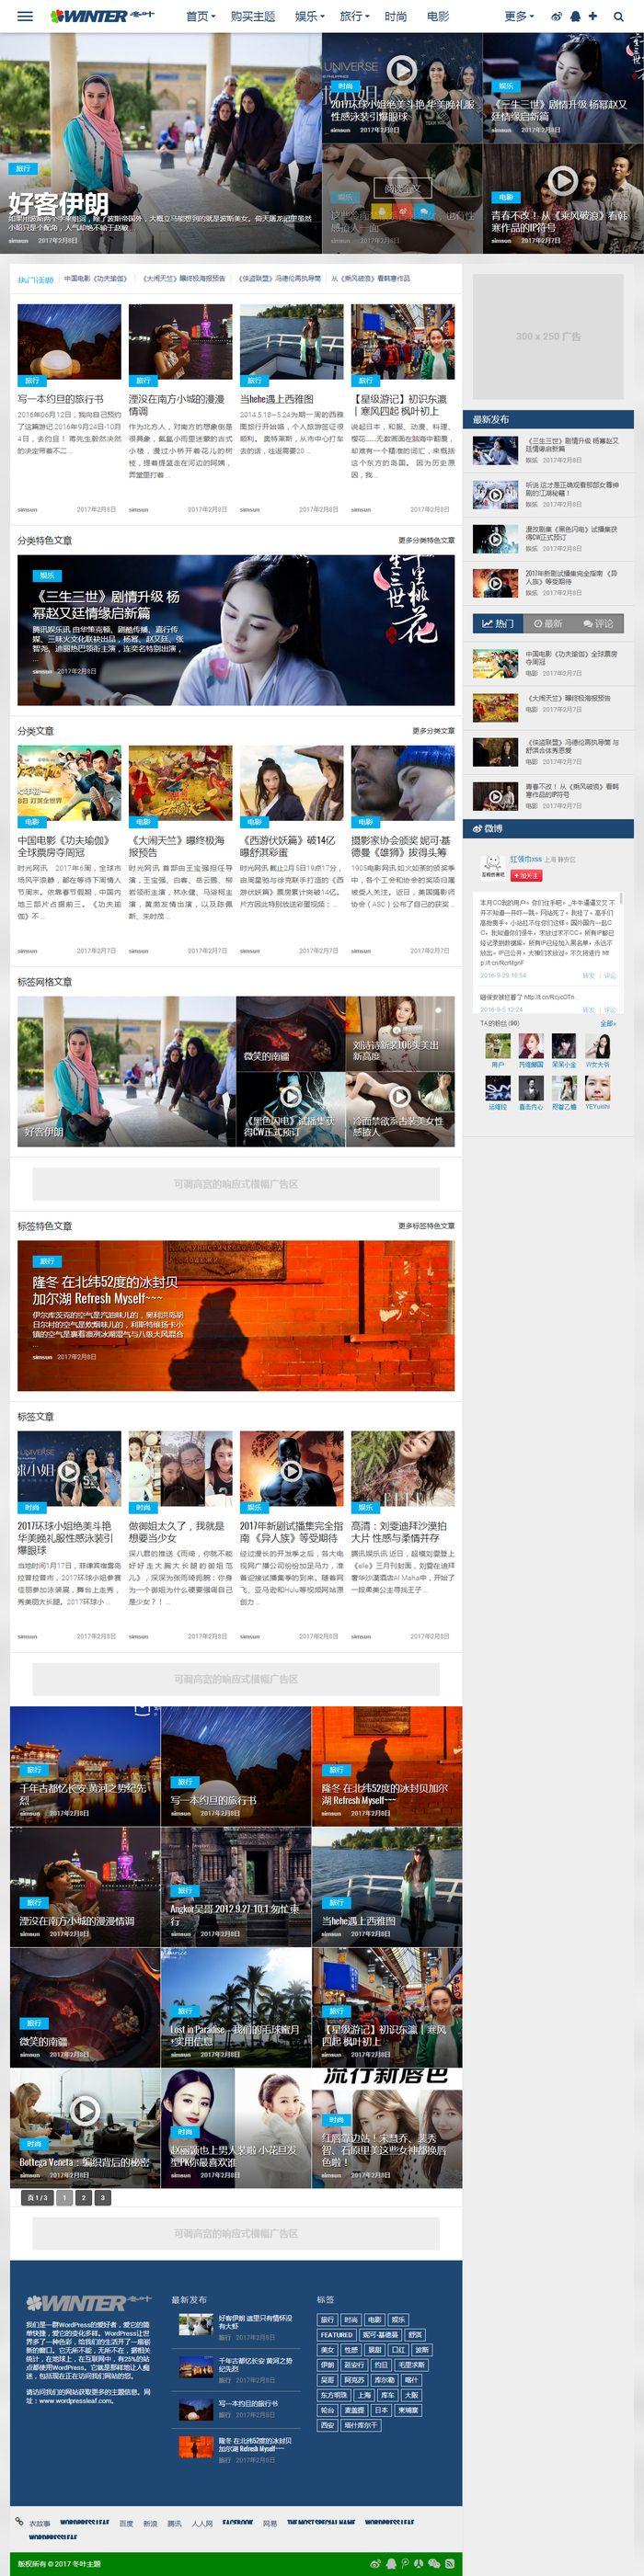 wordpress原创中文主题 冬叶主题V1.0.0发布 杂志博客图片游戏